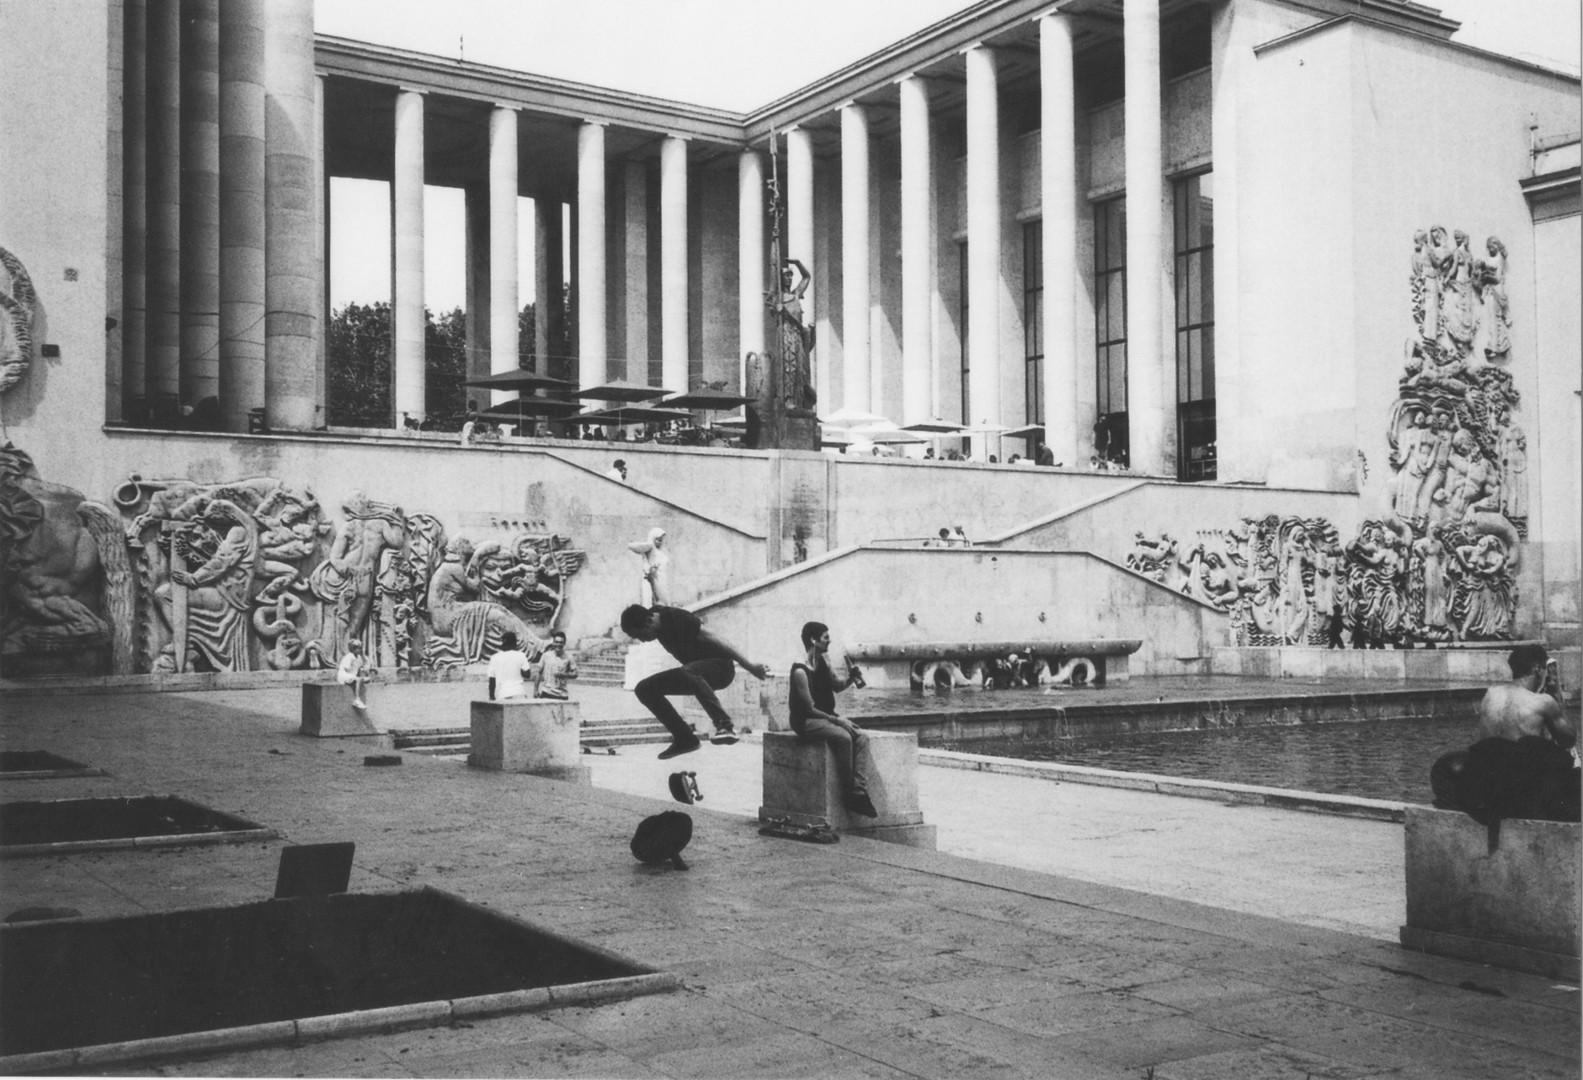 Skateboarders in Paris One